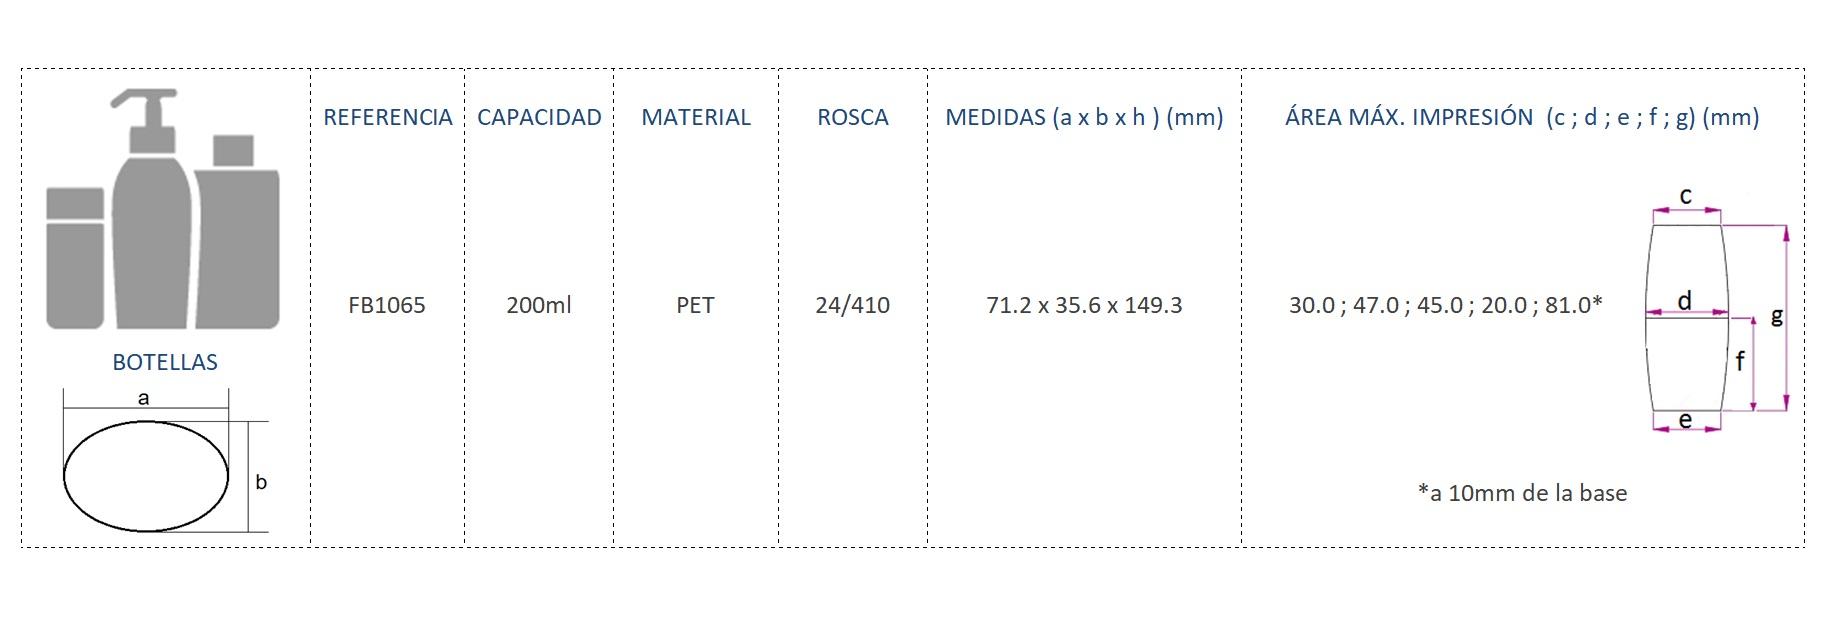 Cuadro de materiales botella FB1065